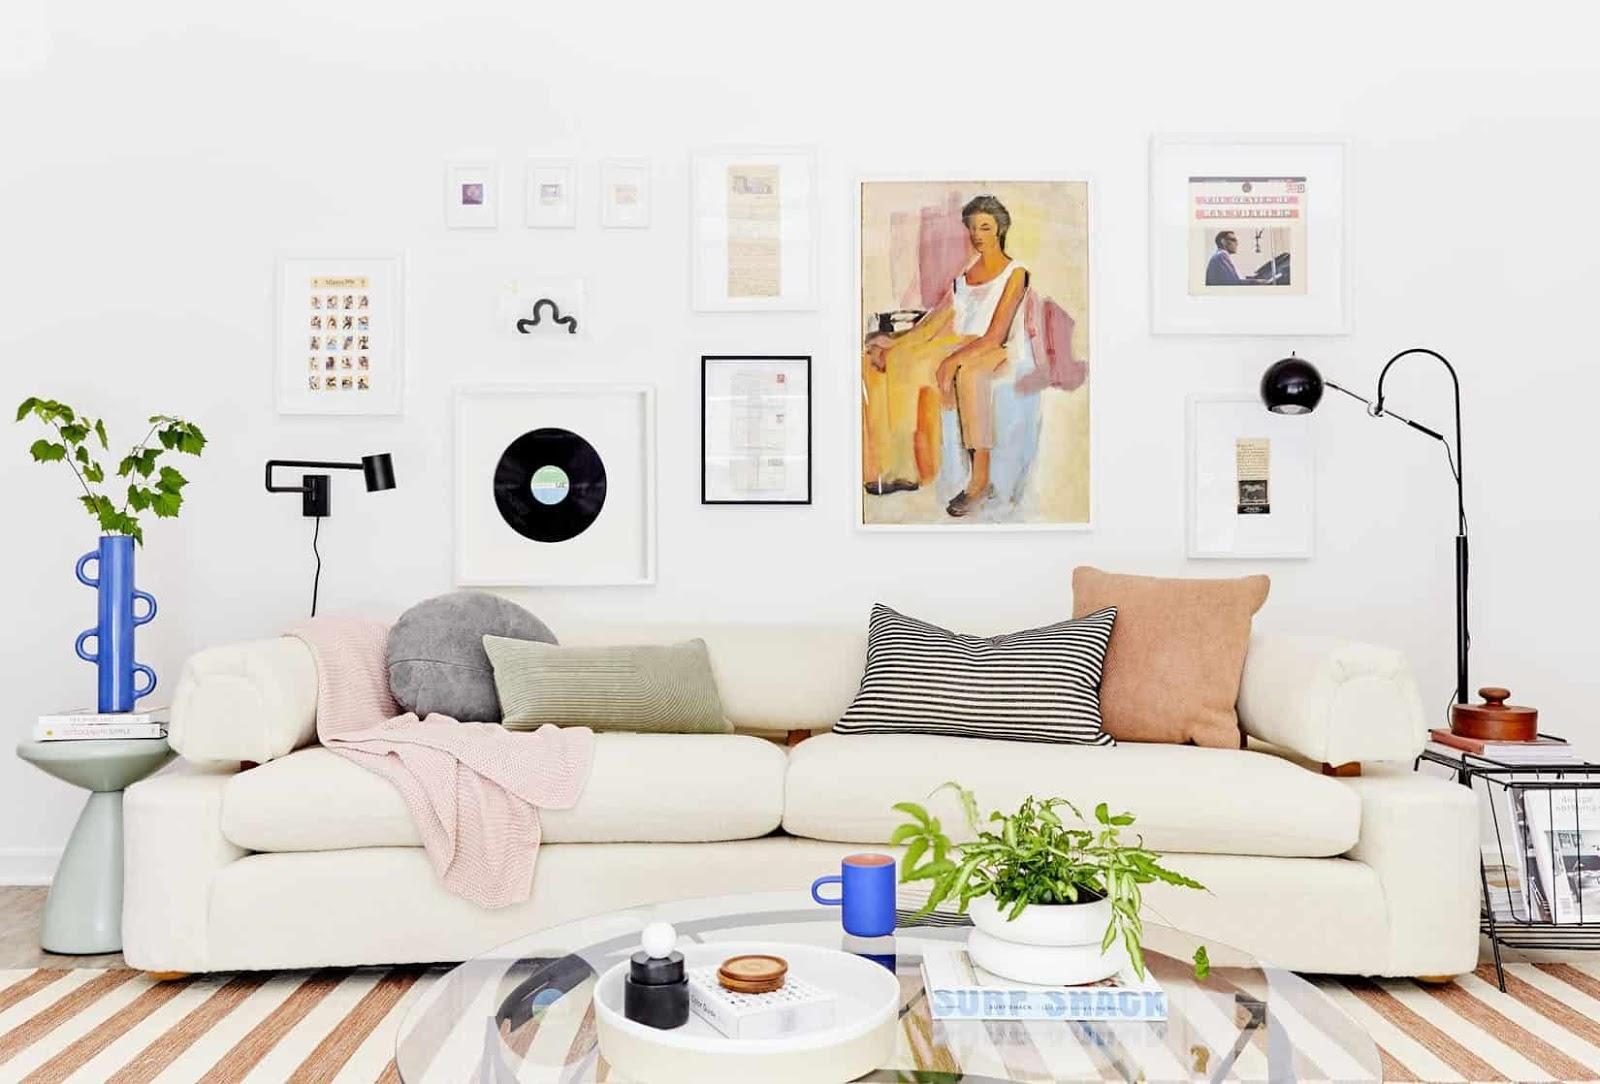 Home decor ideas bedroom